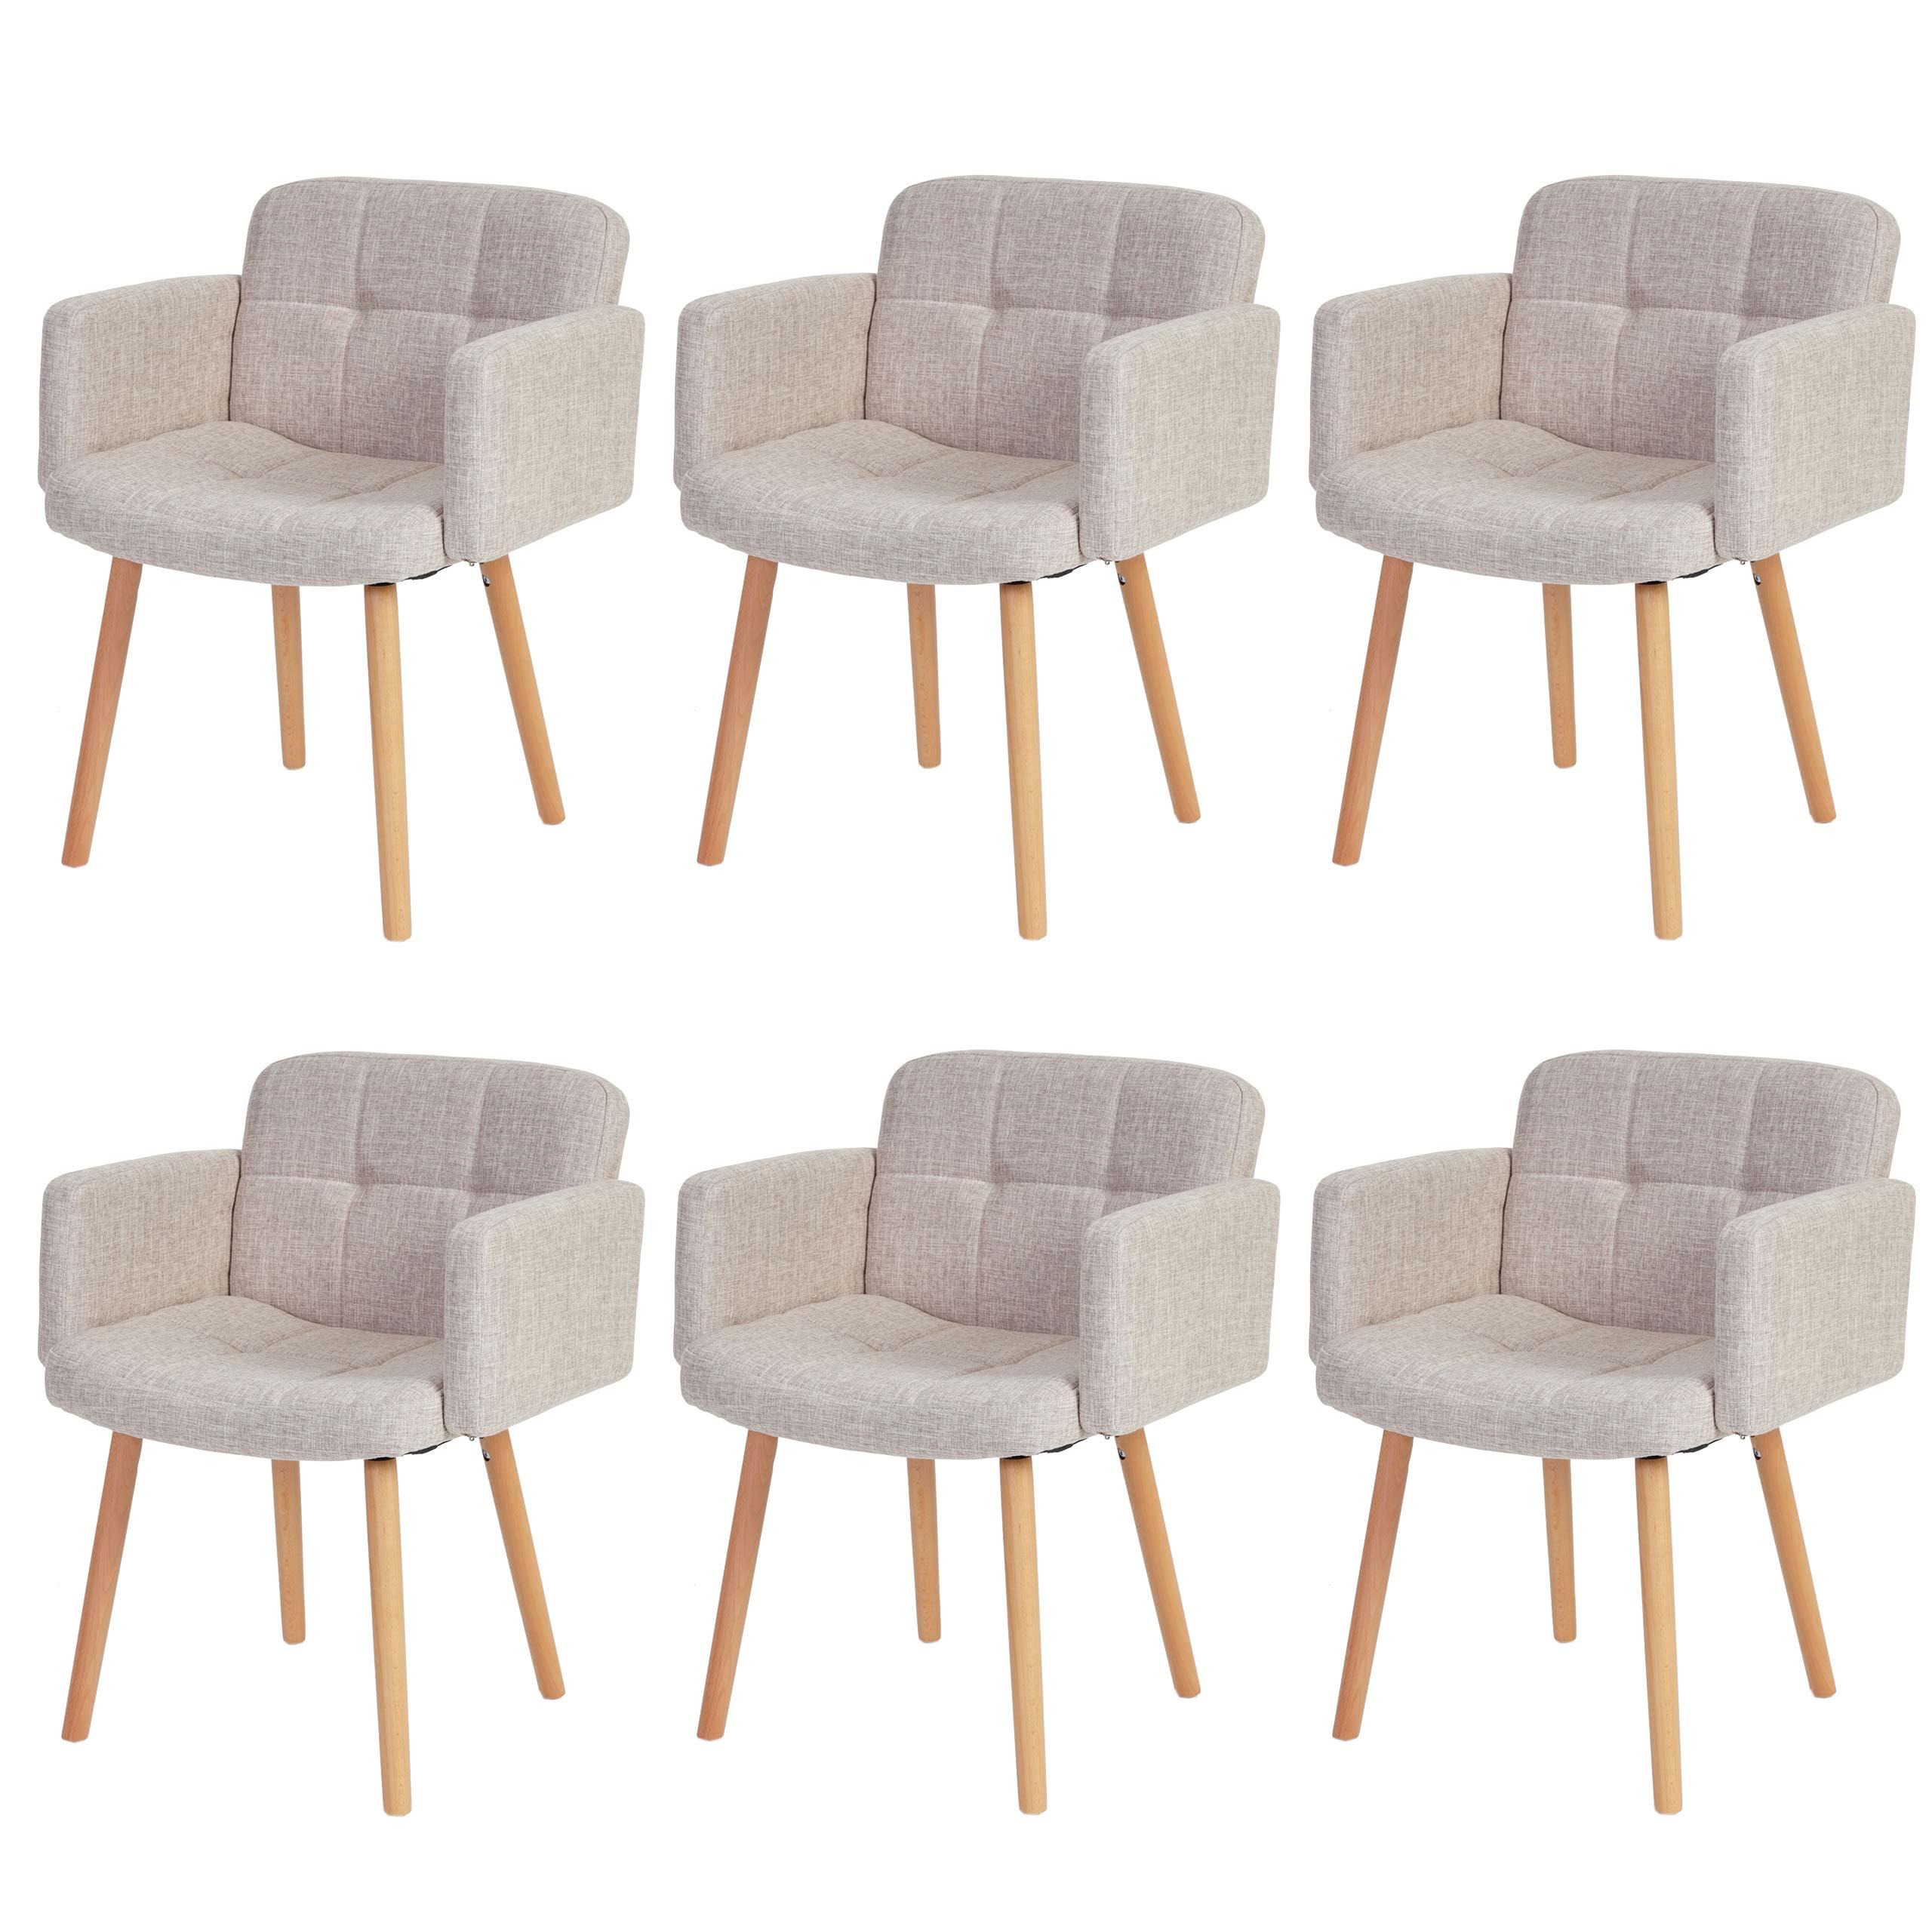 6x esszimmerstuhl houston ii lehnstuhl retro design textil creme grau ebay. Black Bedroom Furniture Sets. Home Design Ideas